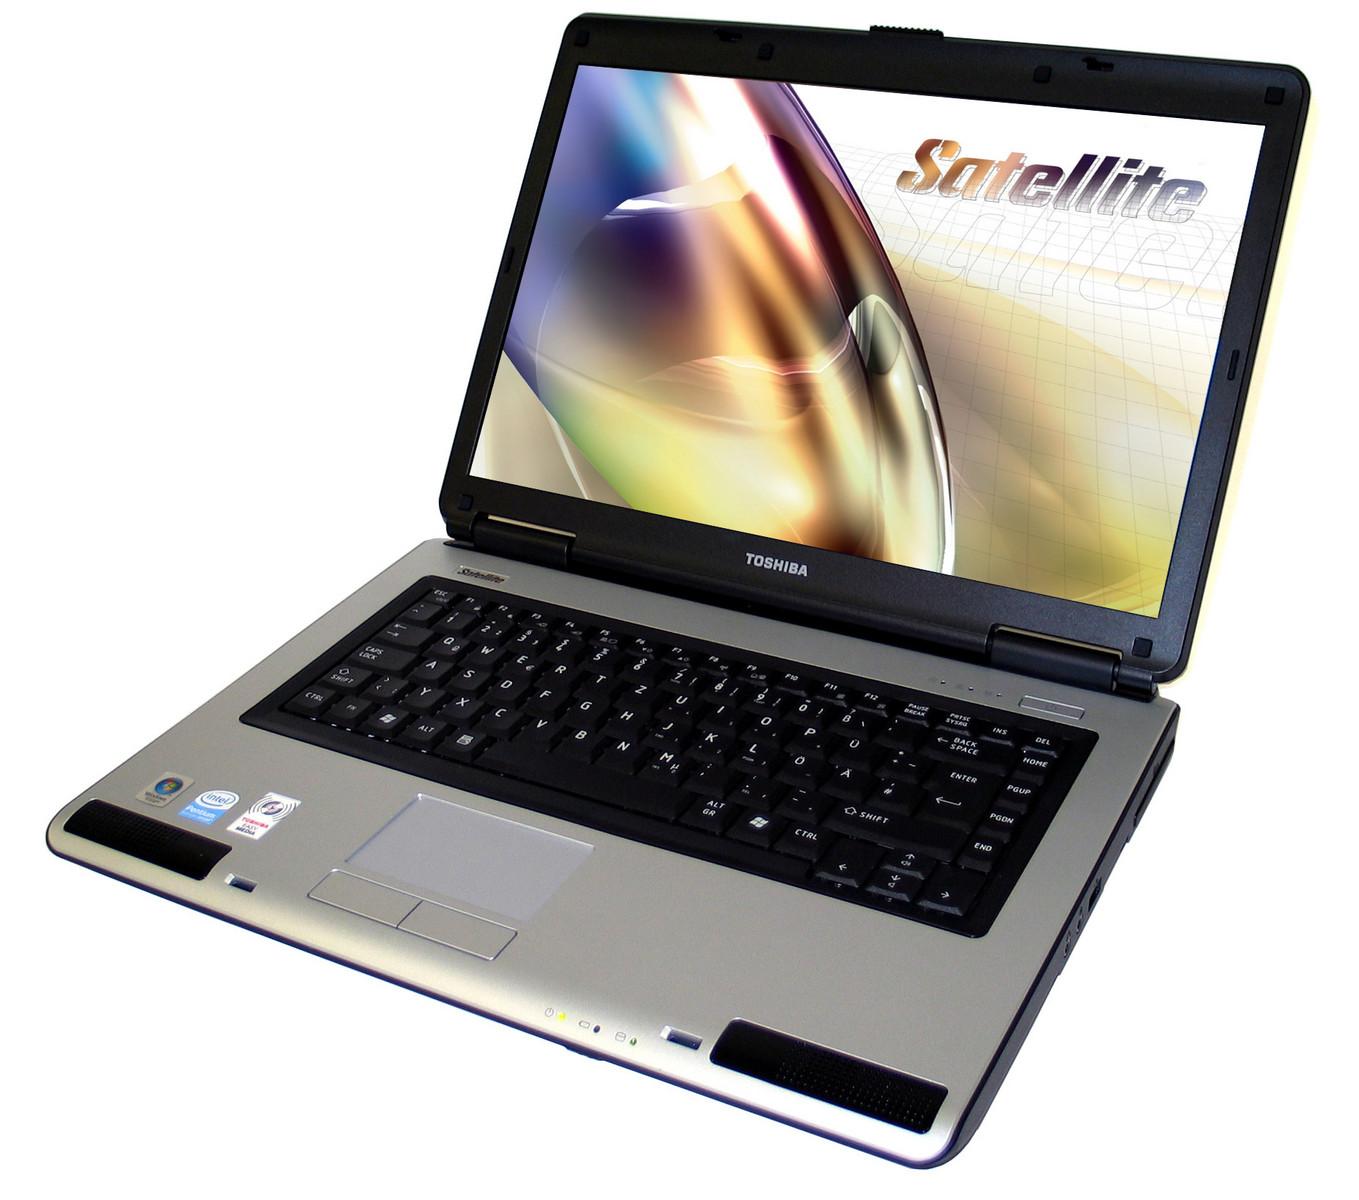 Toshiba Satellite L40 15b Notebookcheck Net External Reviews